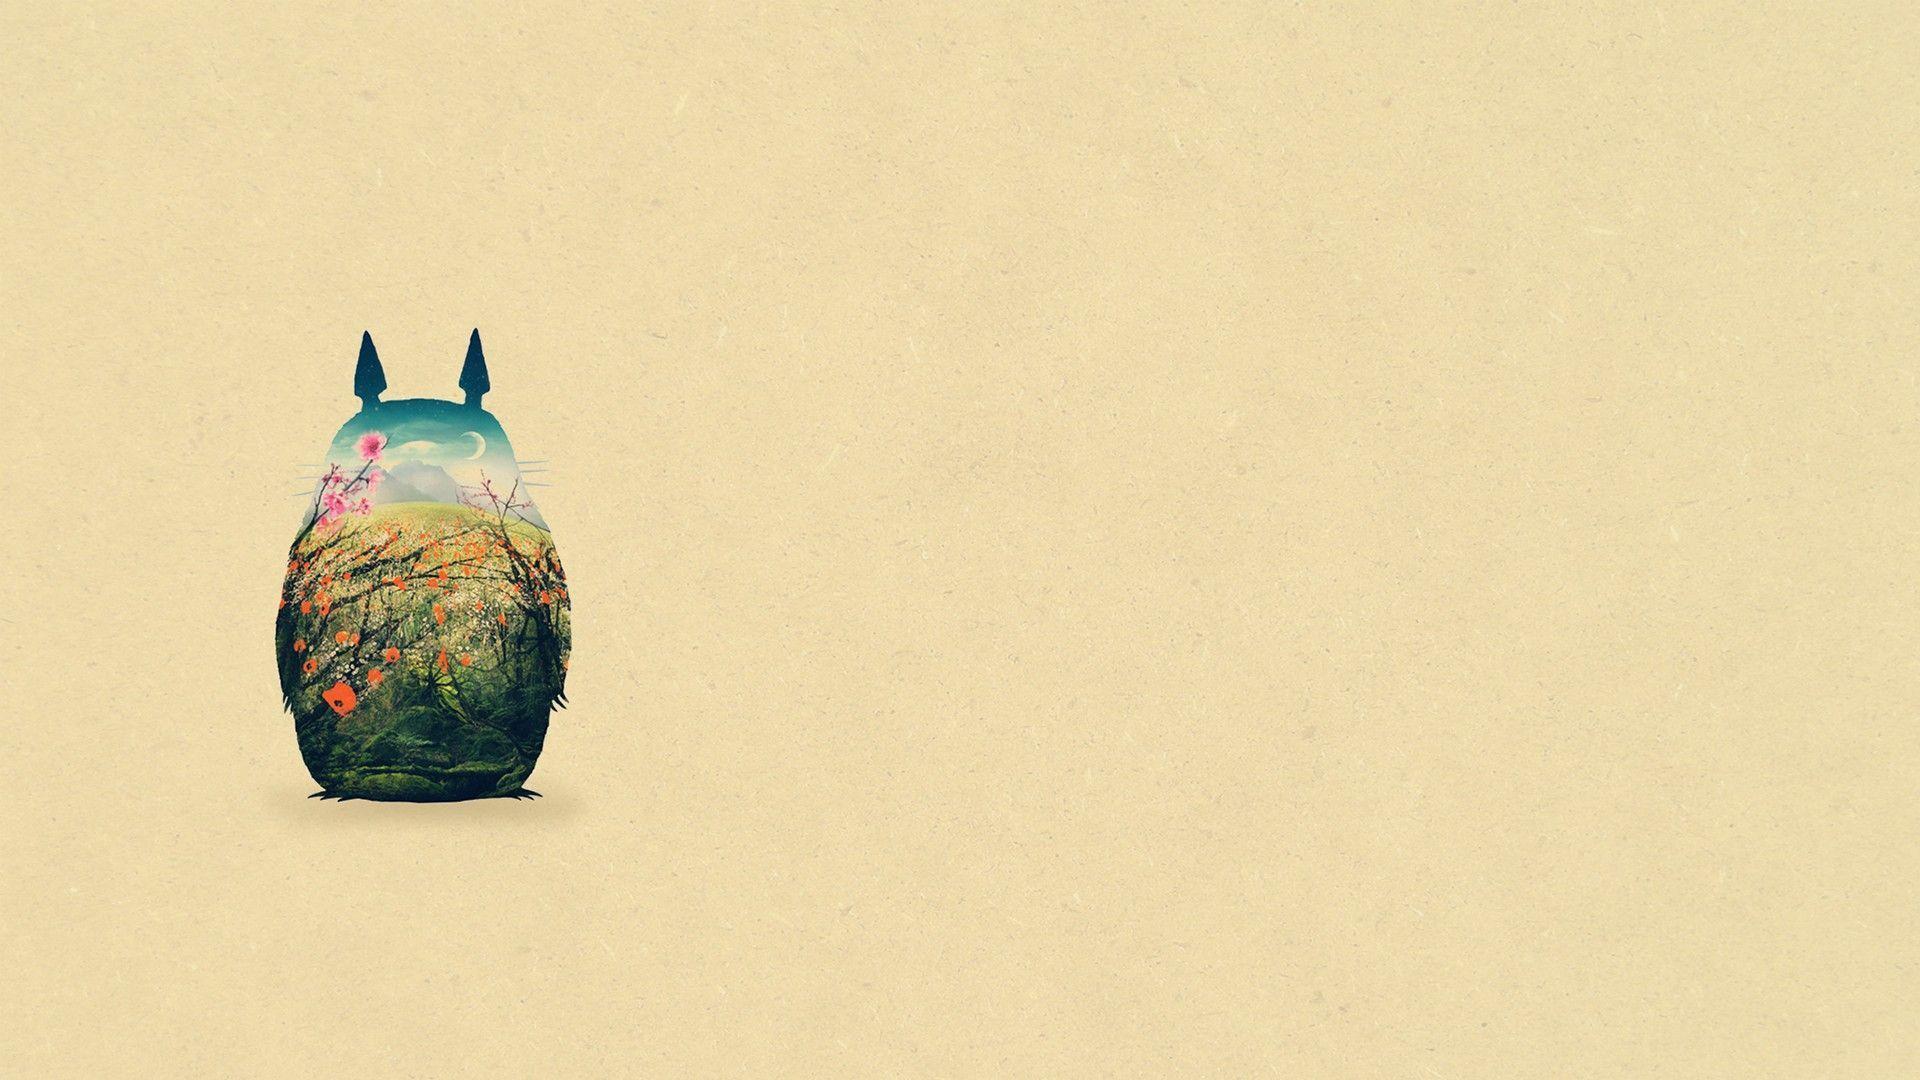 Totoro Wallpapers Hd Wallpaper Cave